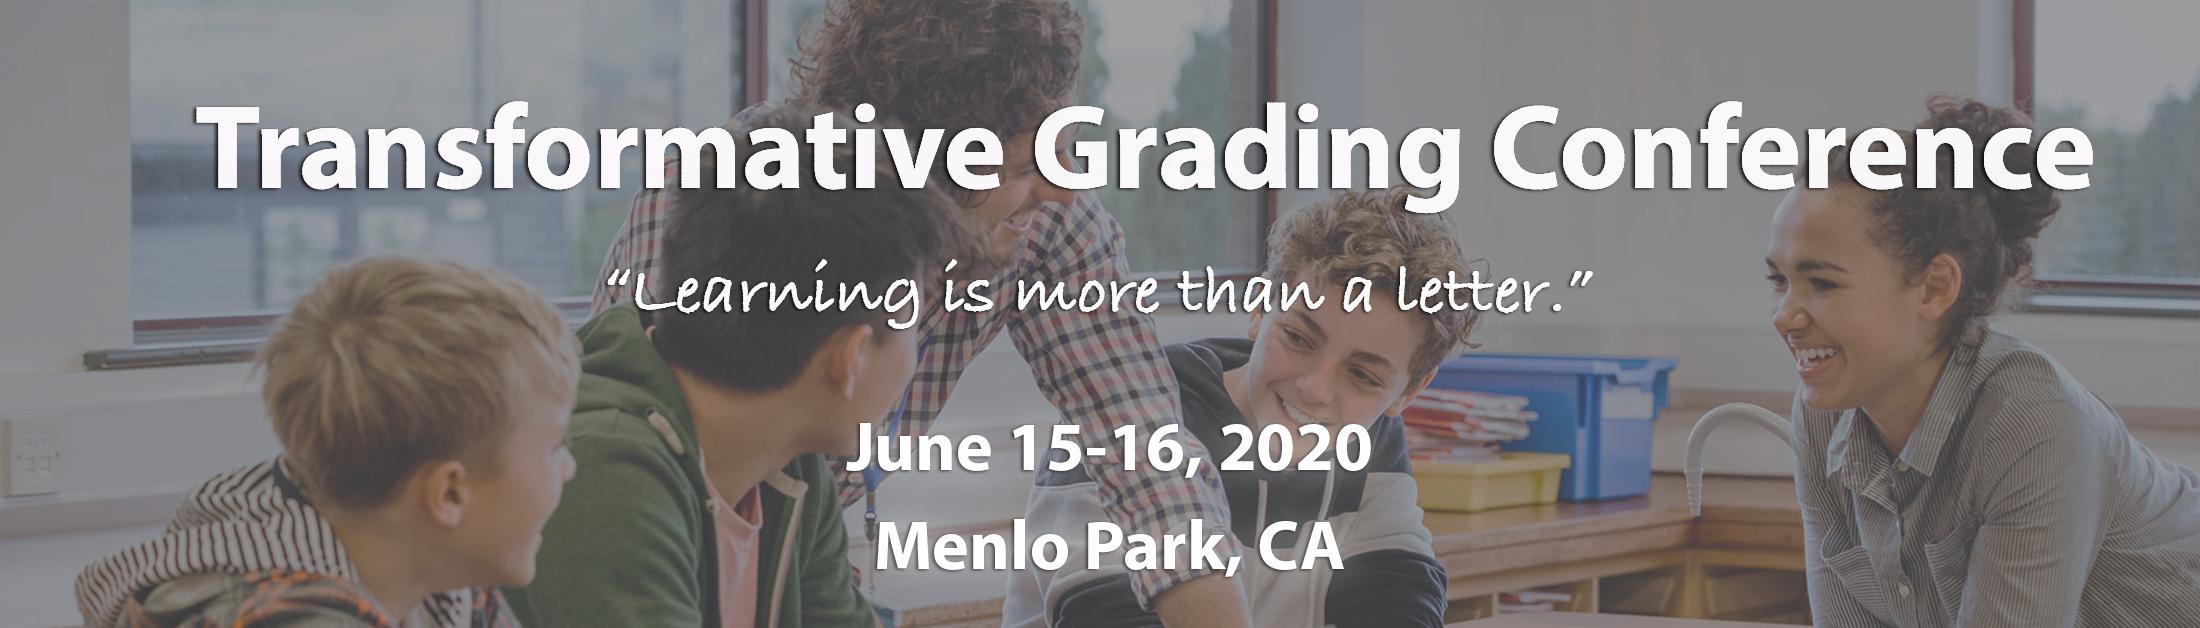 Transformative Grading Conference Banner